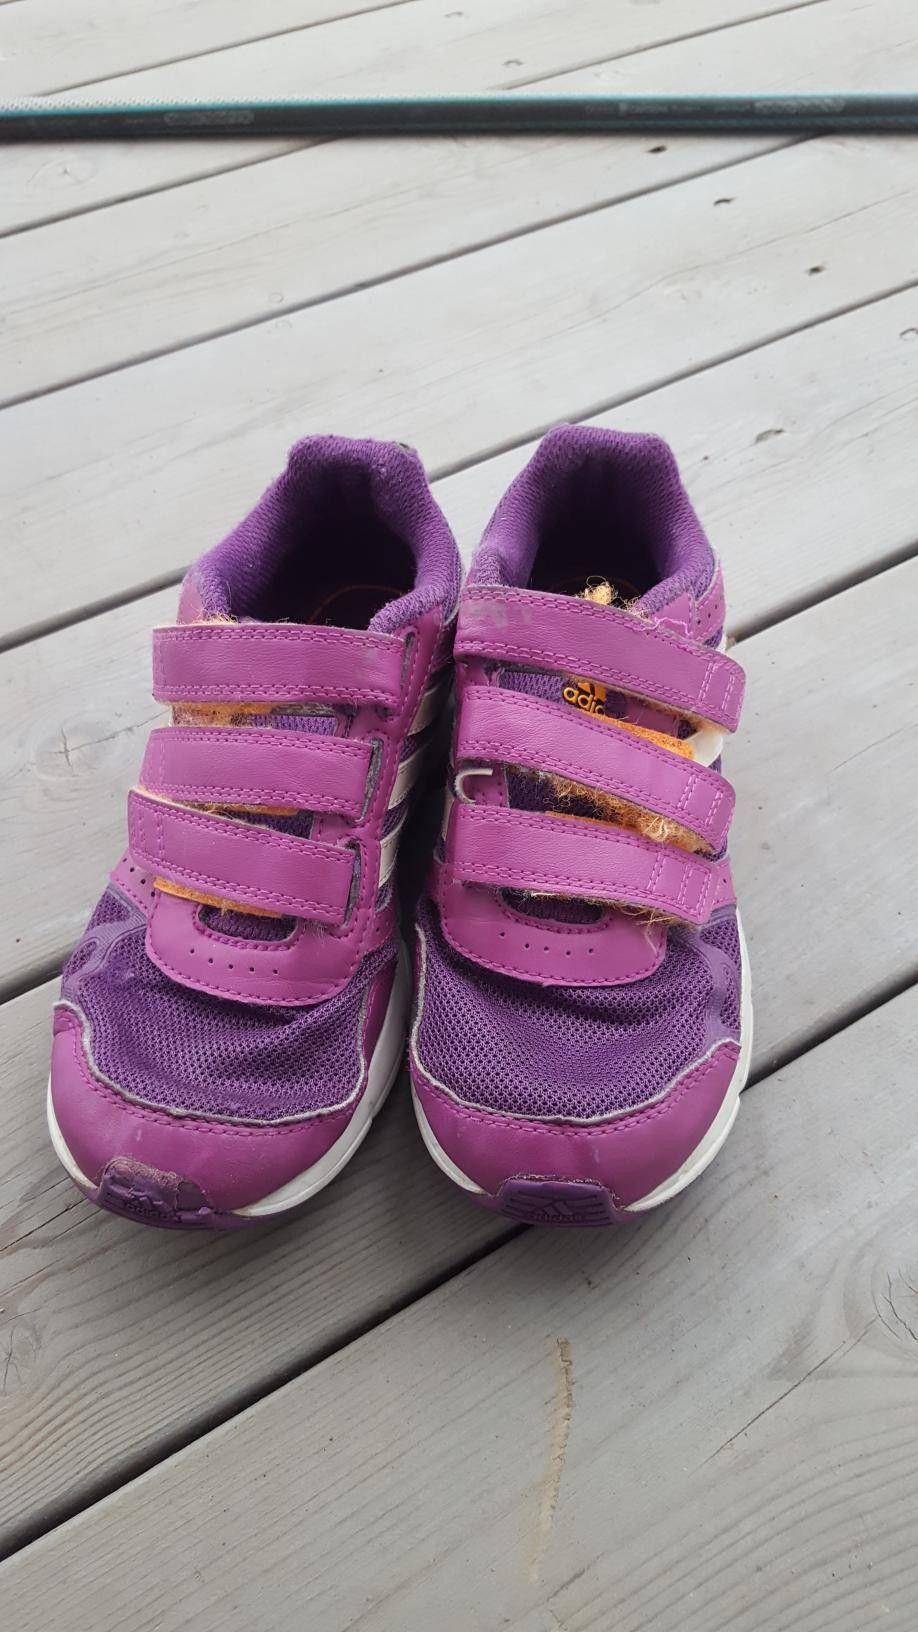 1d32b9de73c Adidas sko str 32   FINN.no